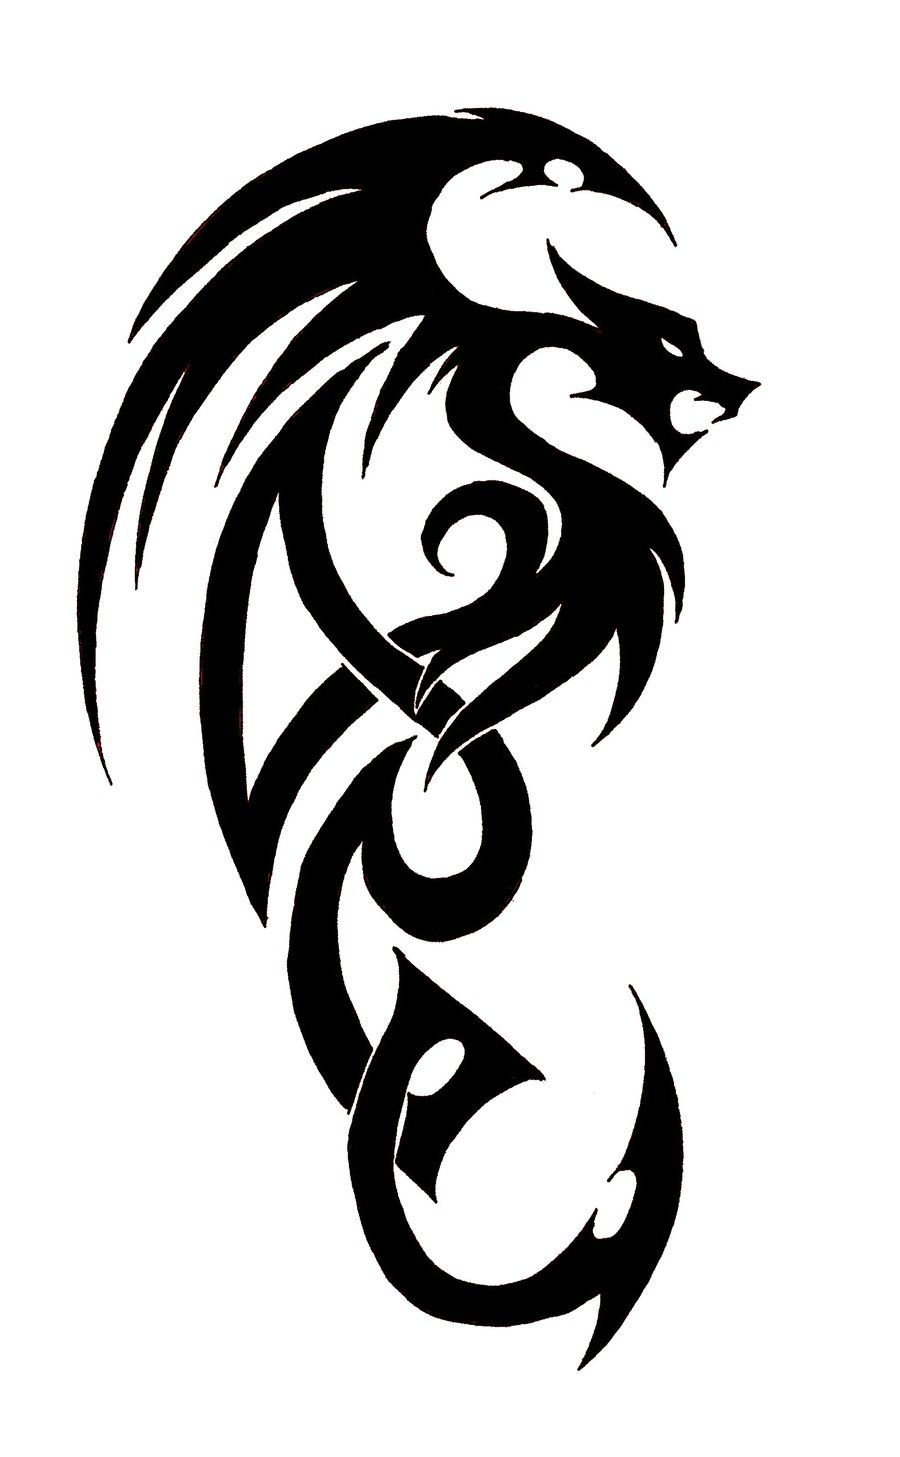 Tattoo Simple Dragon Dragon Tattoo Images Celtic Dragon Tattoos